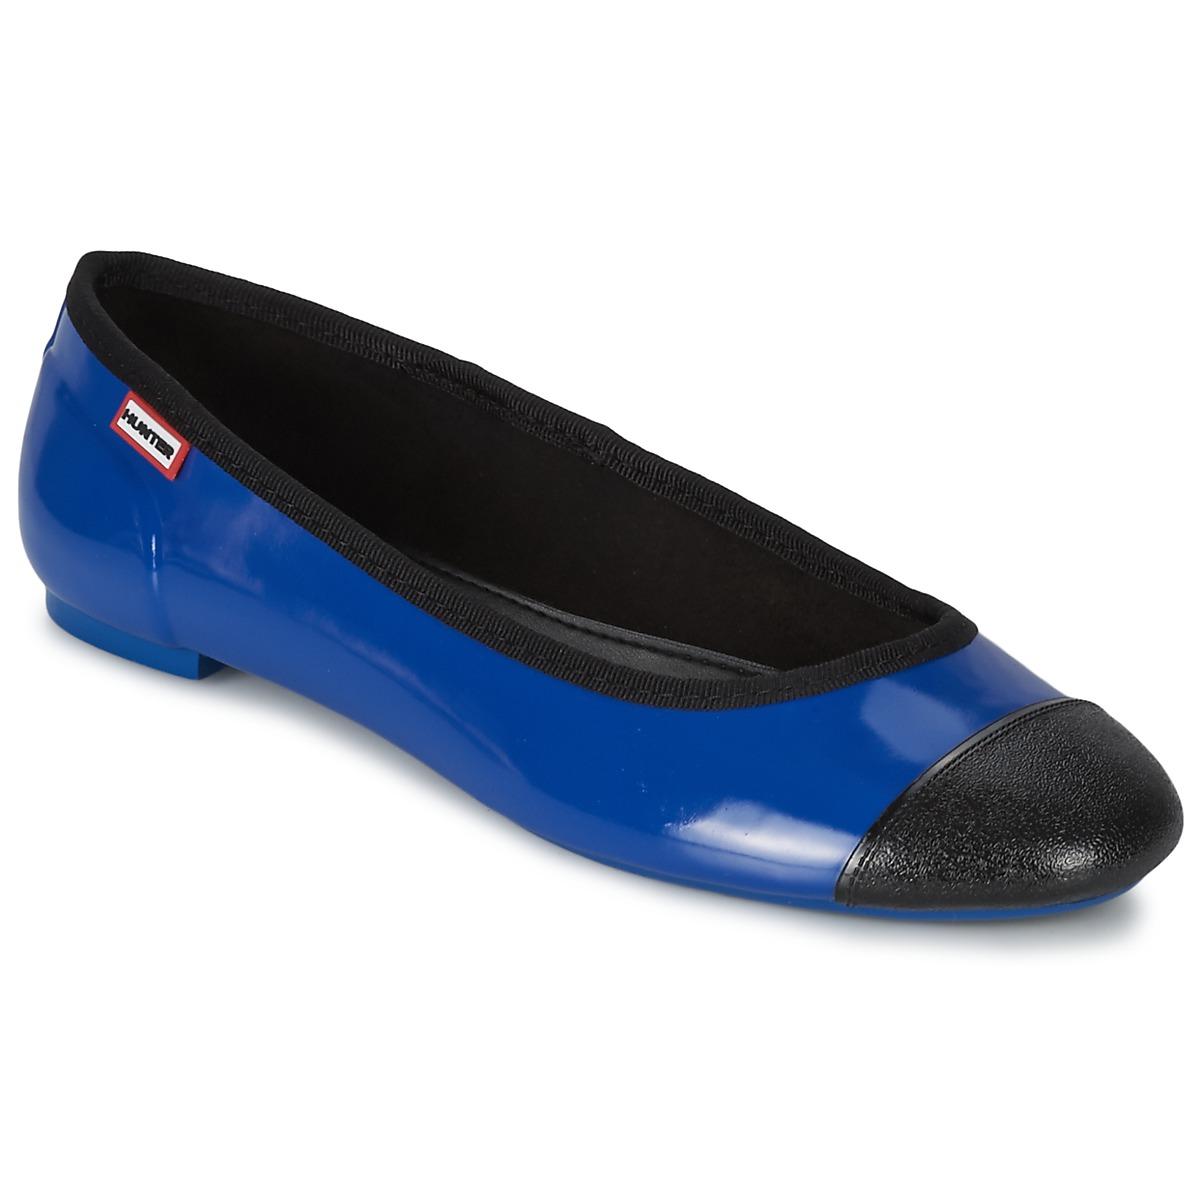 Hunter ORIGINAL BALLET FLAT Blau - Kostenloser Versand bei Spartoode ! - Schuhe Ballerinas Damen 59,39 €